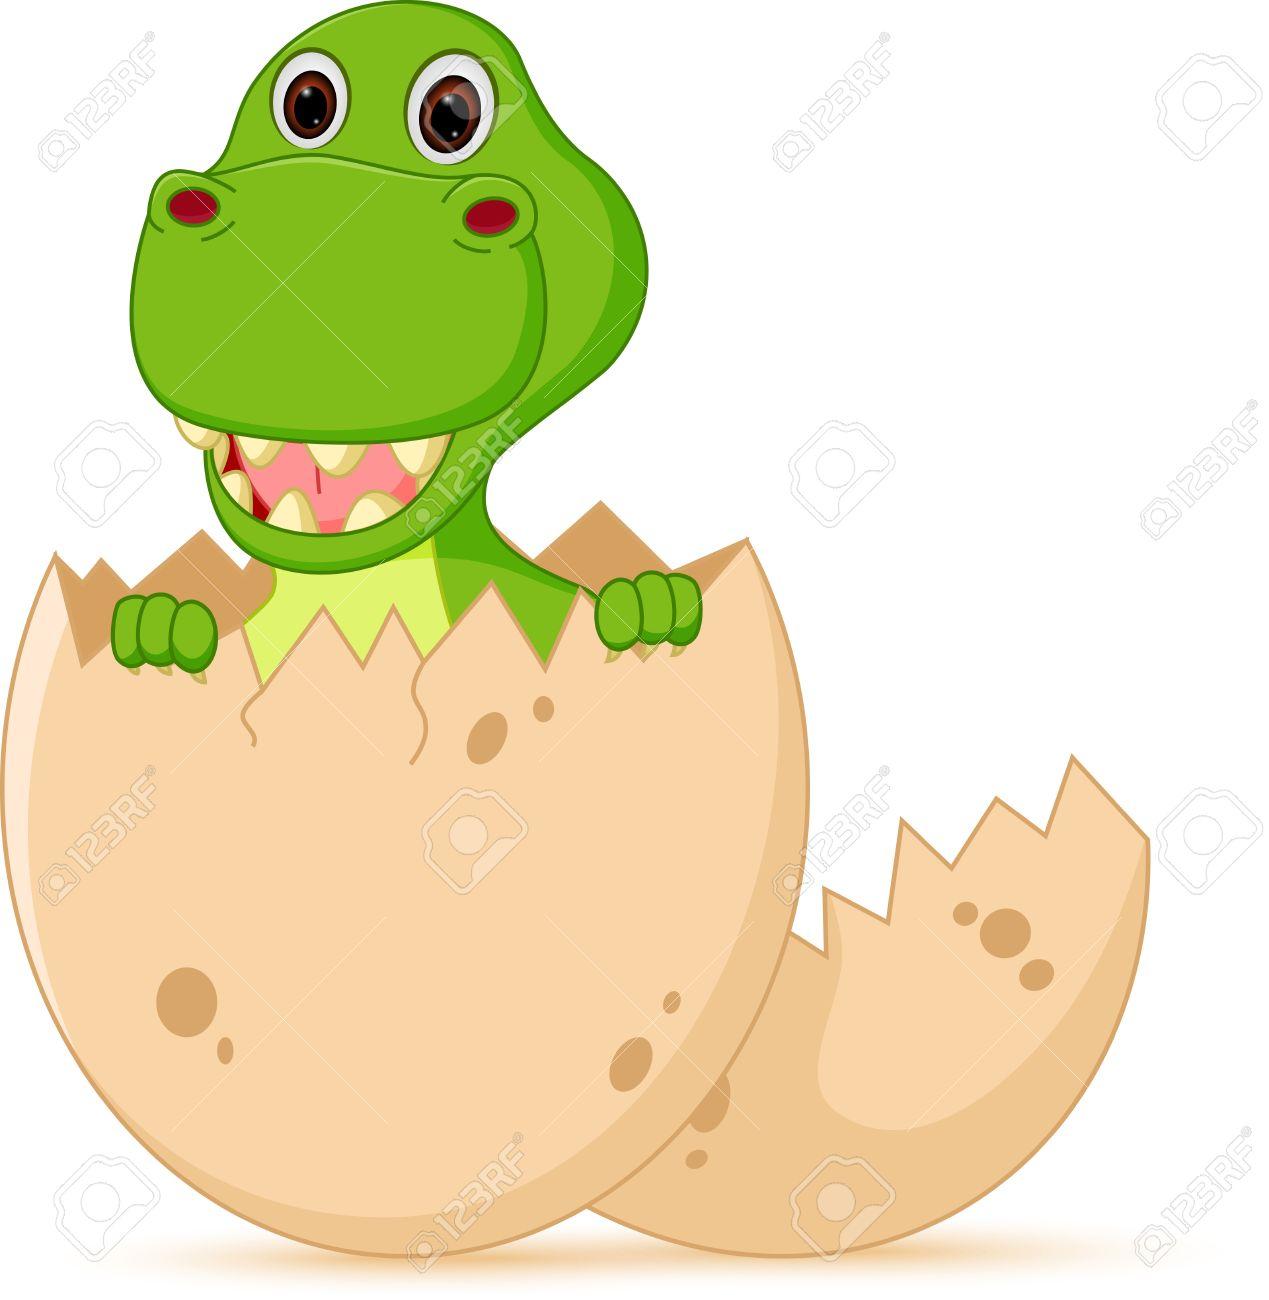 Baby Dinosaurs Clipart,dinosaurs,cute dino,baby dinosaurs,dinosaurs clipart,digital  download | Baby dinosaurs, Dinosaur, Collage diy